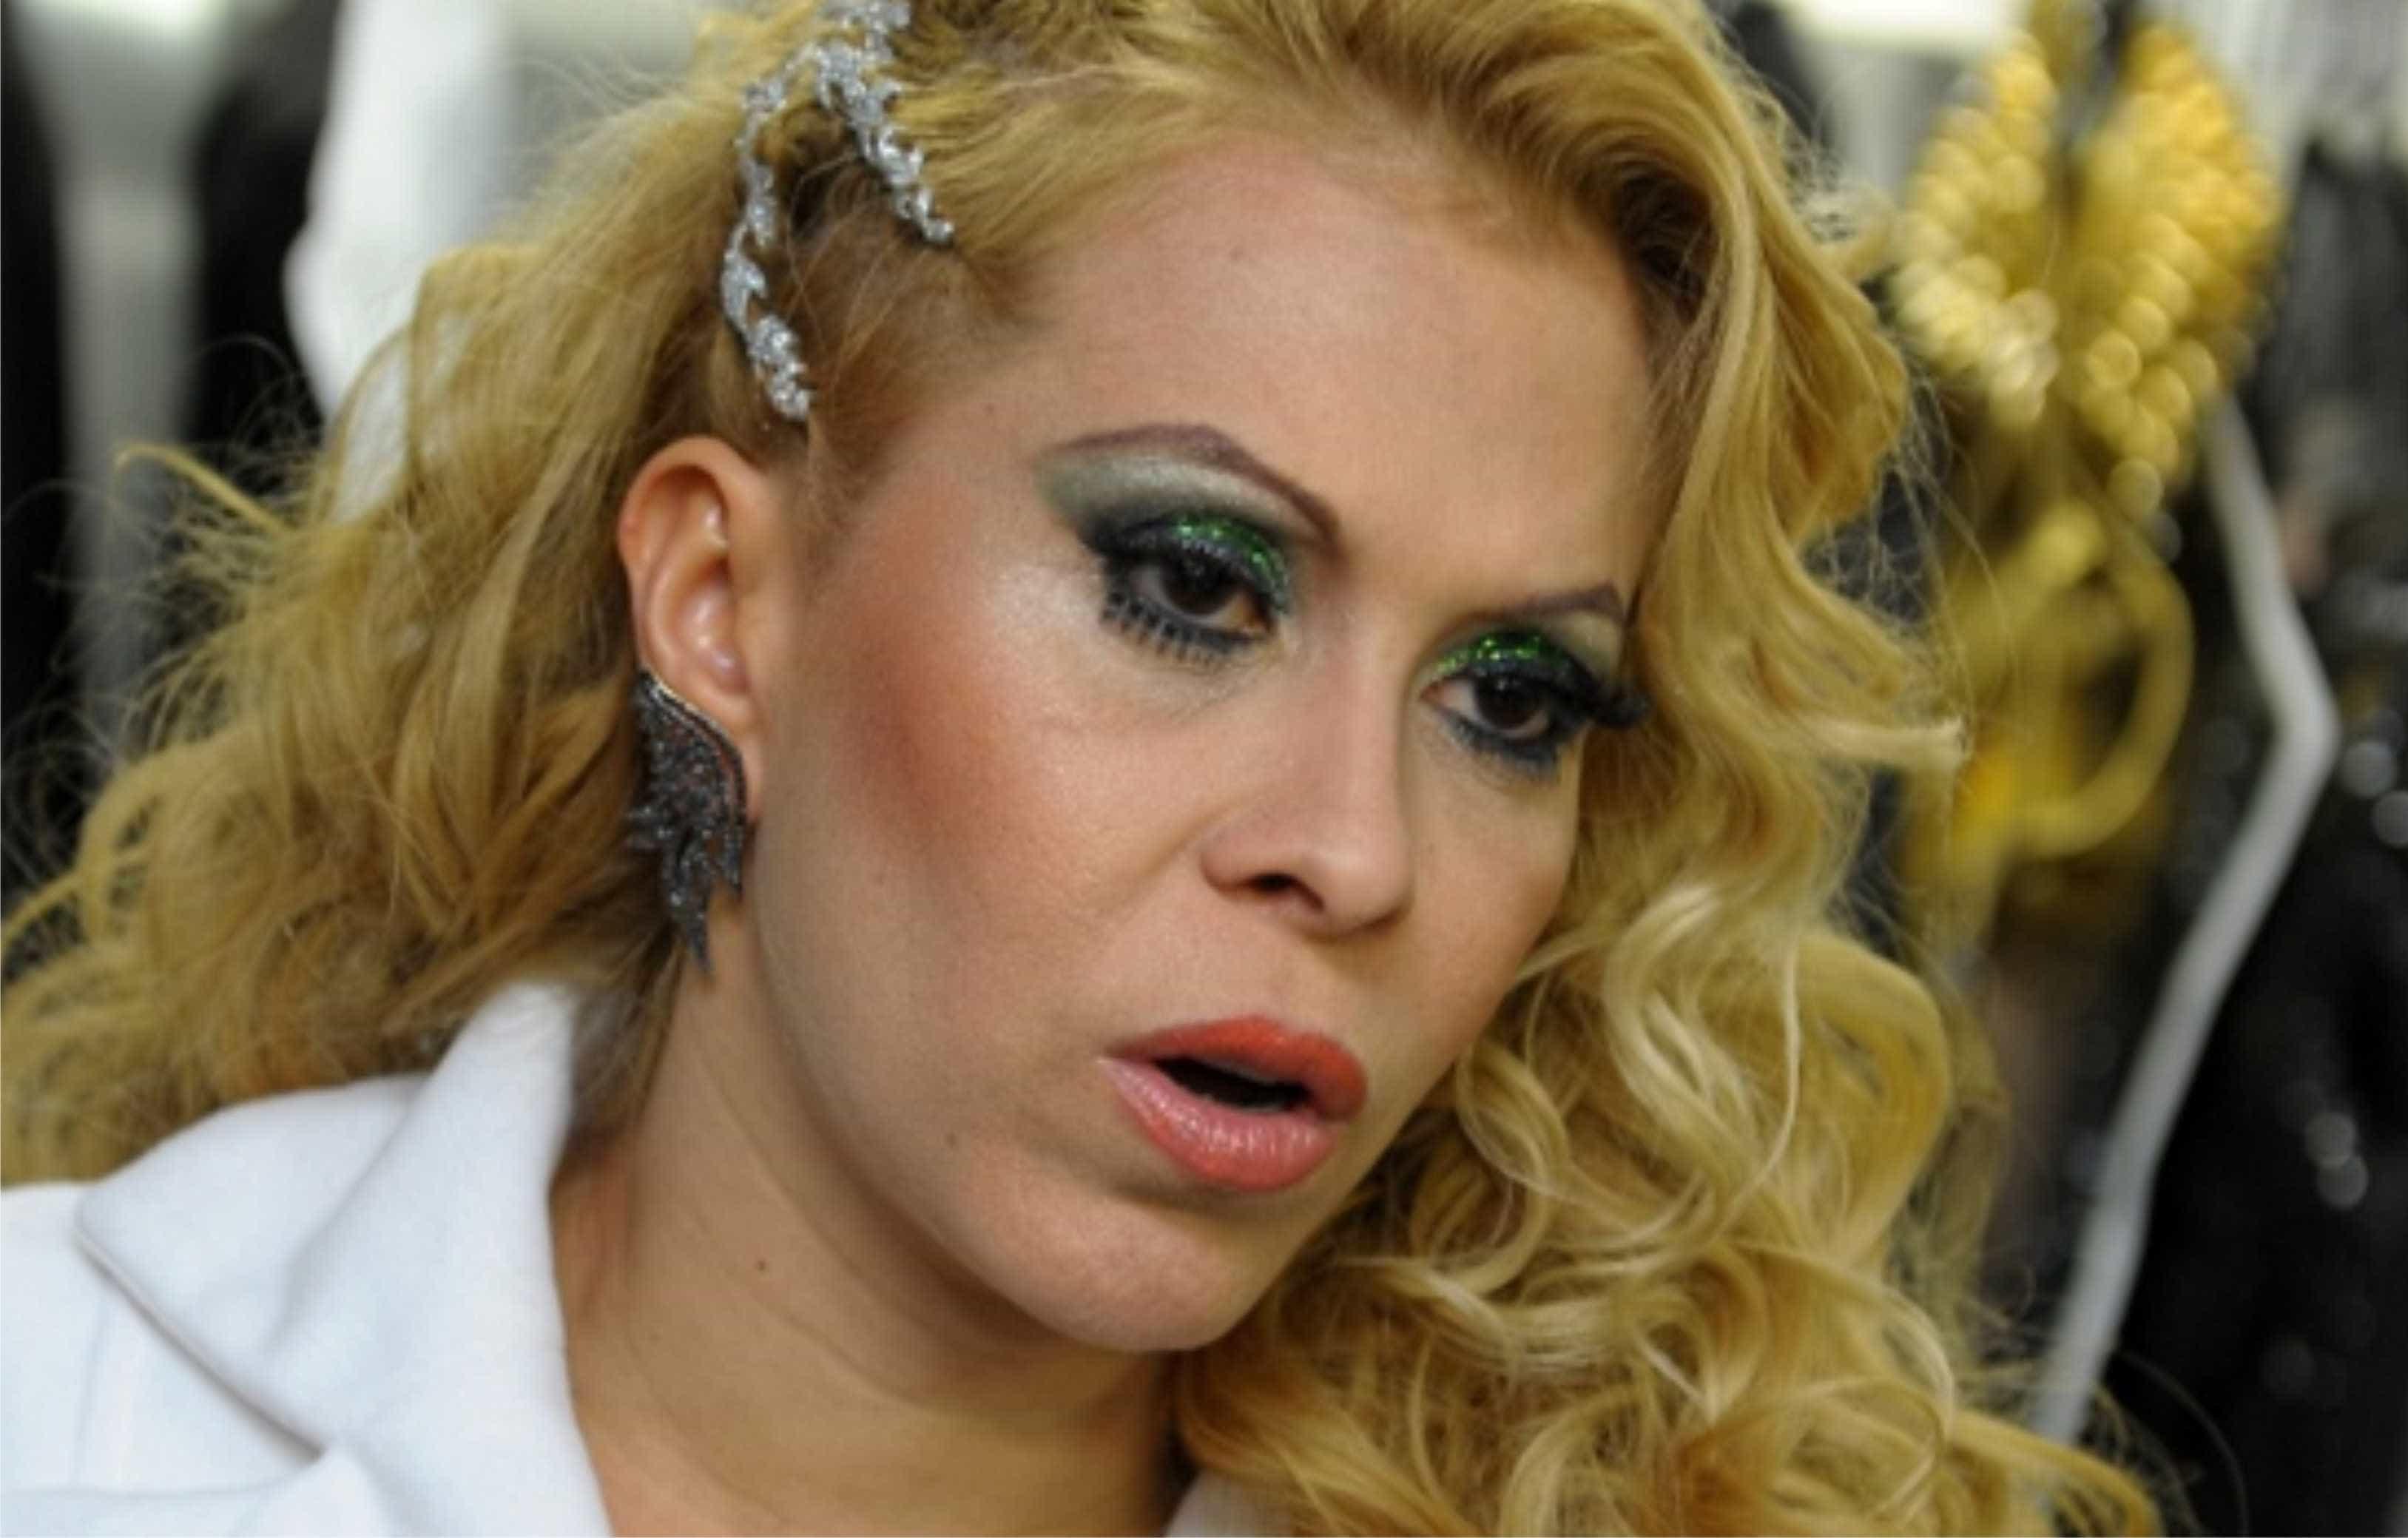 Músico detona Joelma após demissão: 'Santa do pau oco'